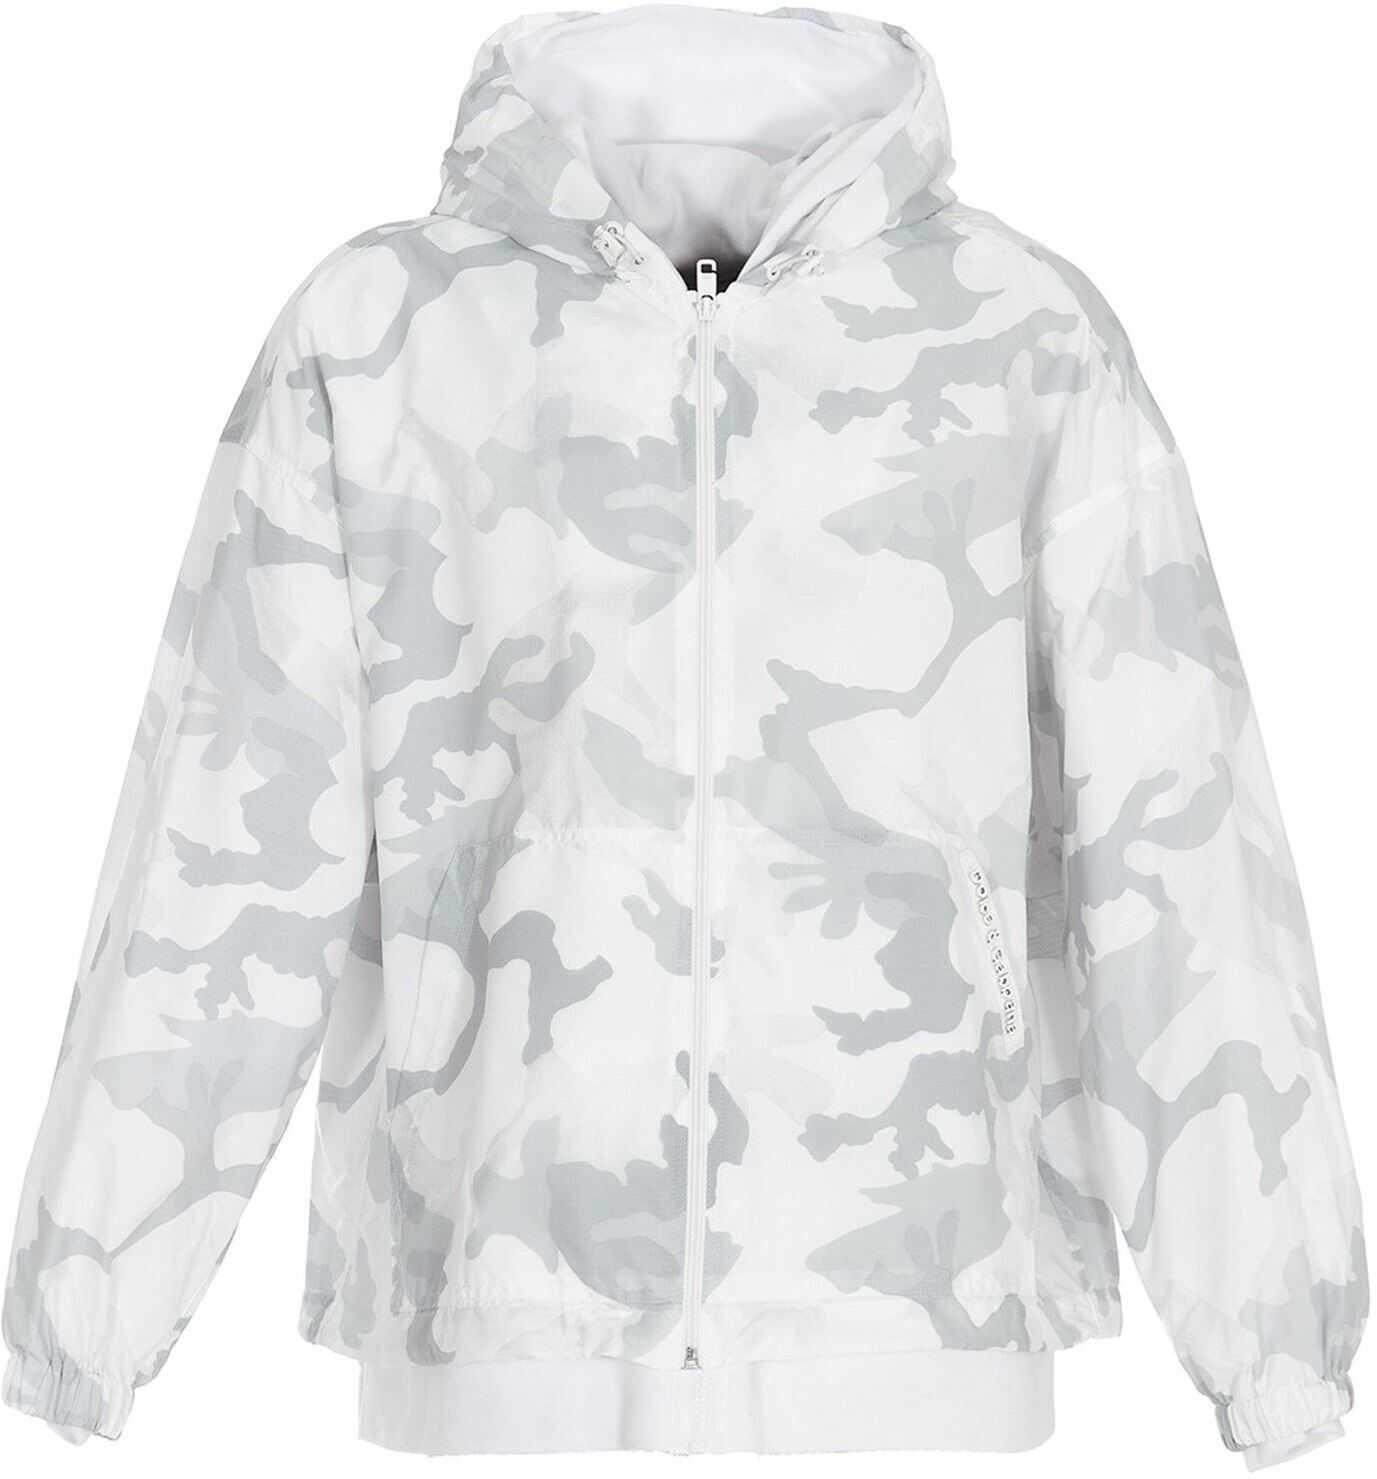 Dolce & Gabbana Hooded Camouflage Jacket In Grey Grey imagine